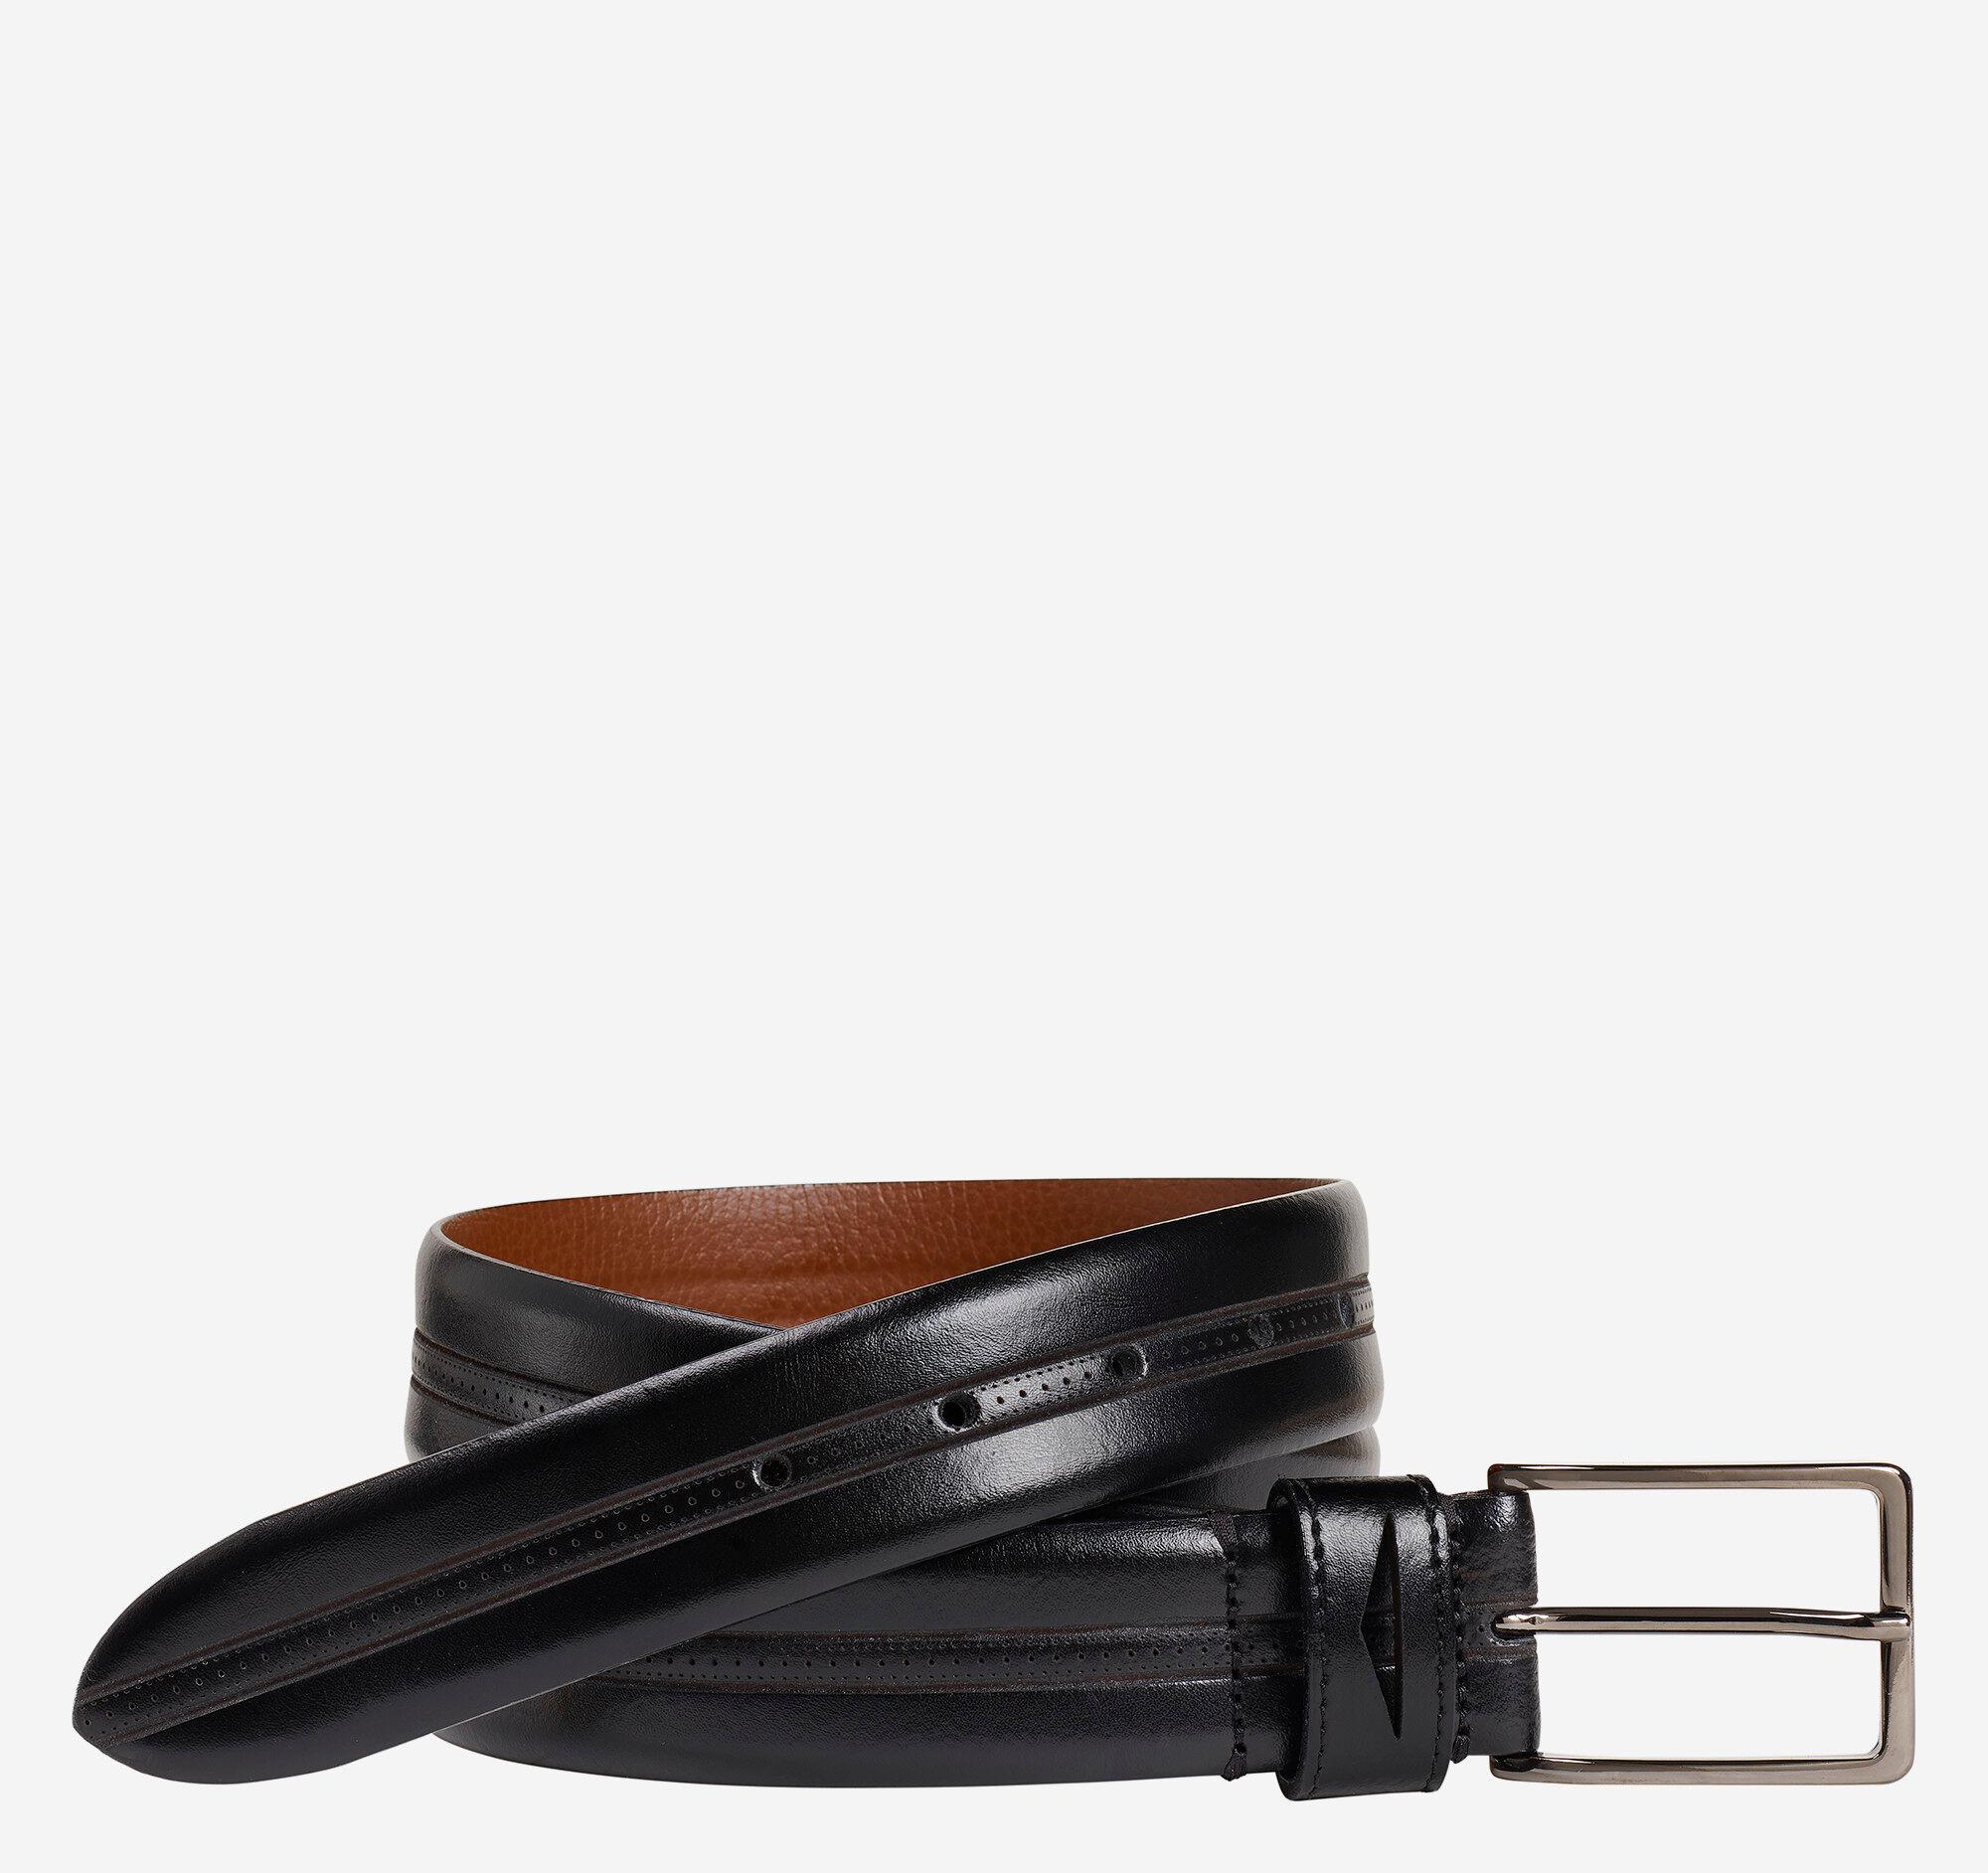 Johnston & Murphy Men's Penny Loop Belt - Black - Size 34